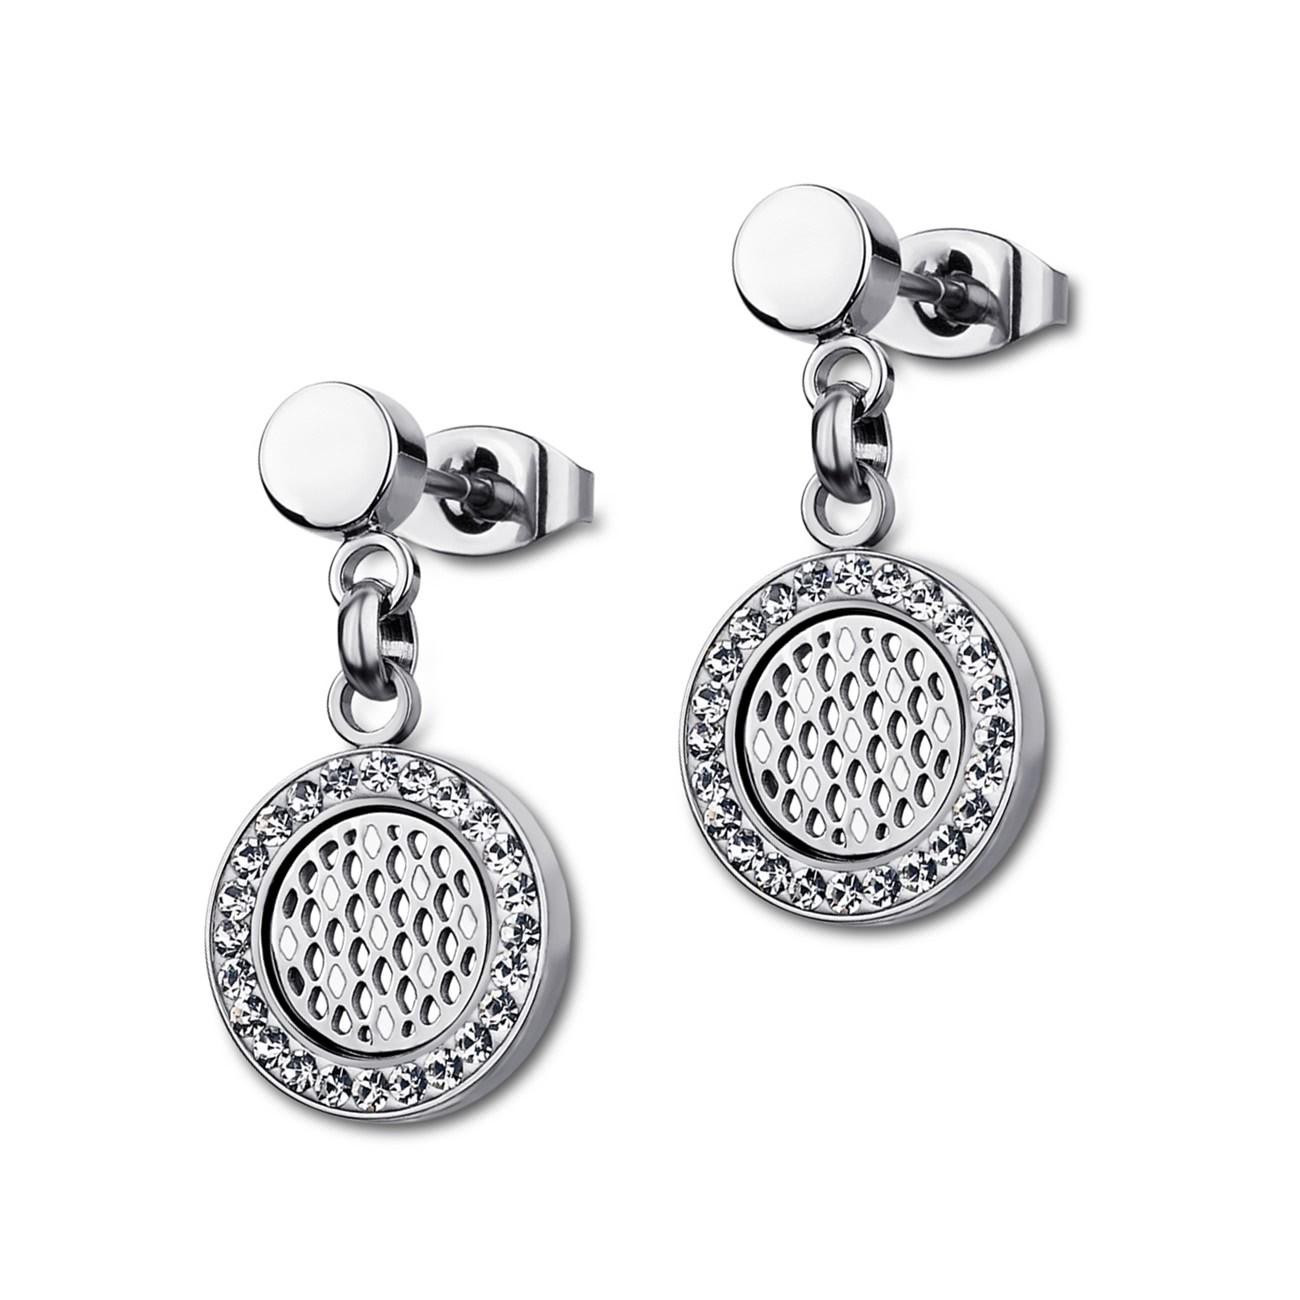 LOTUS Style Ohrringe Damen Edelstahl silber LS1777-4/1 Ohrstecker JLS1777-4-1